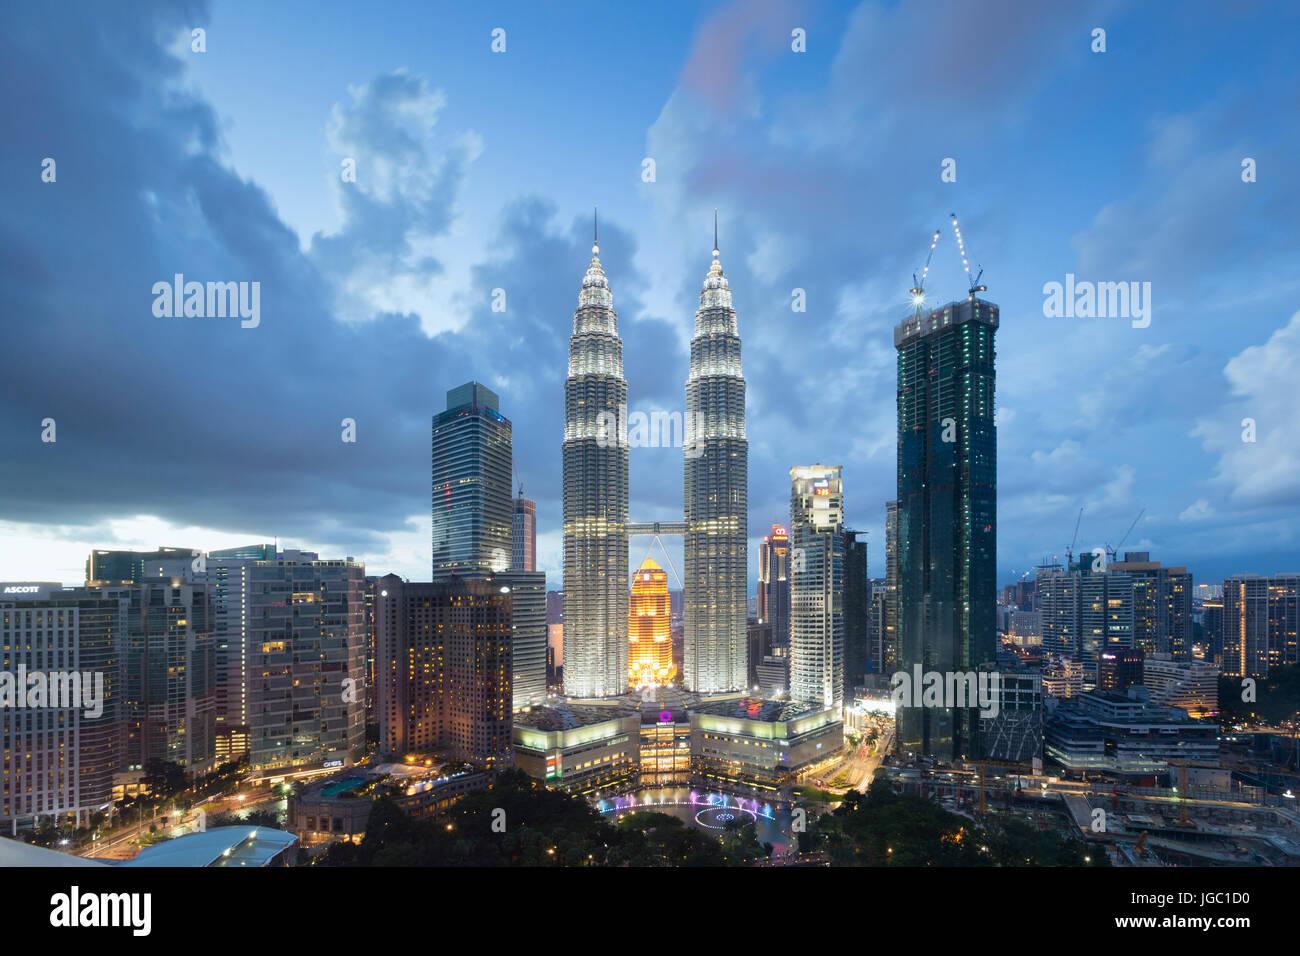 Petronas Zwillingstürme in der Abenddämmerung, Kuala Lumpur, Malaysia Stockbild